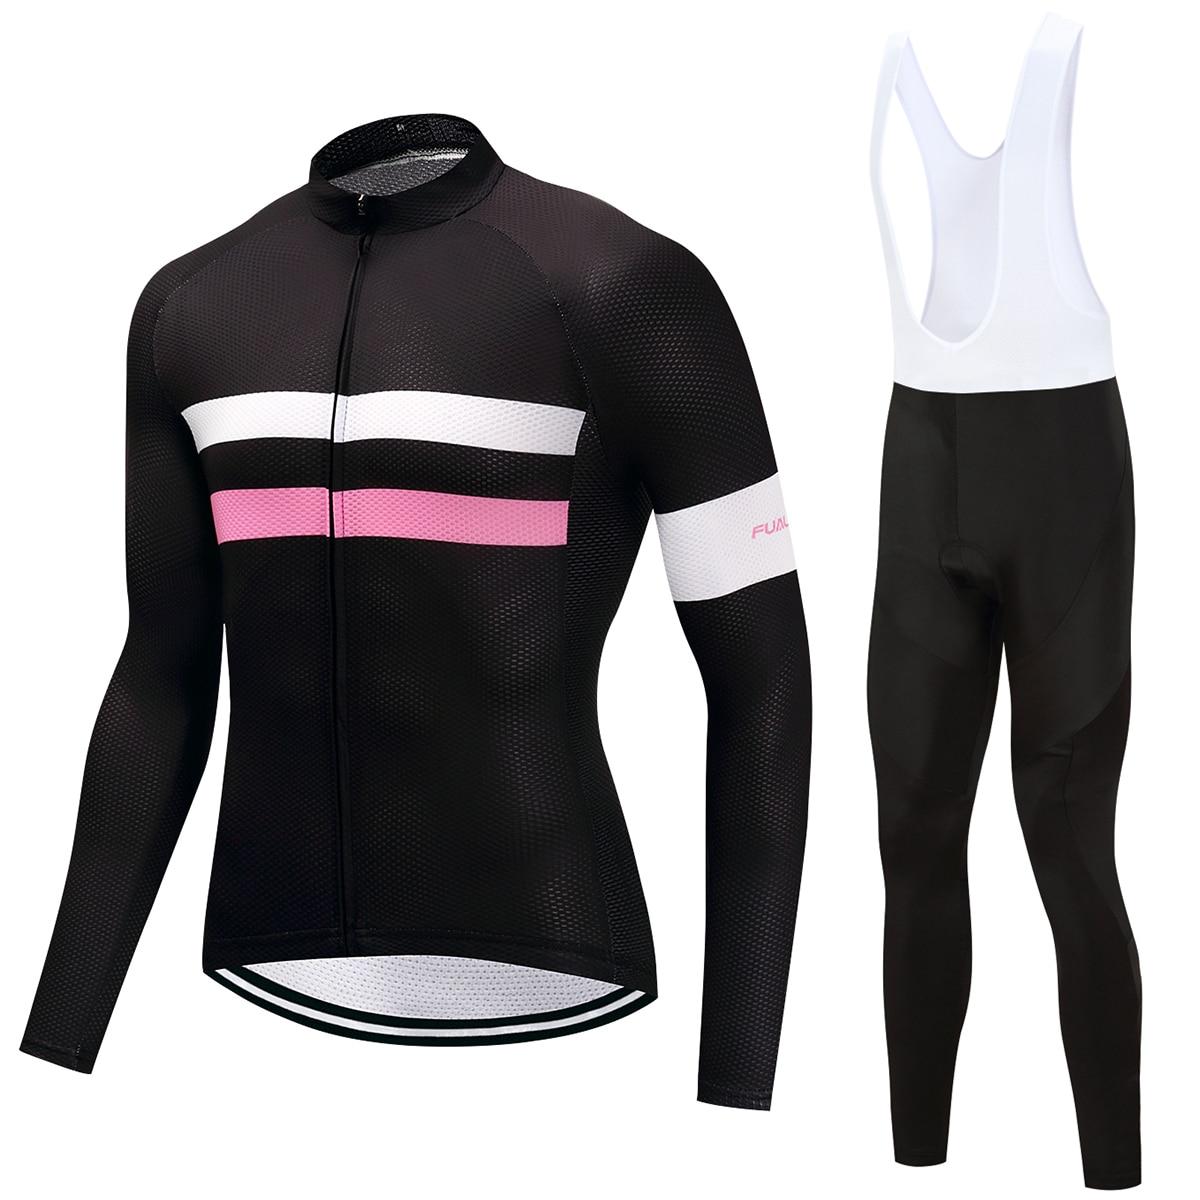 FUALRNY Men Bike Pro Team Long Sleeve Ropa Ciclismo Cycling Jersey & Bib Pants Set Riding Bicycle Sportswear Kits Colorful